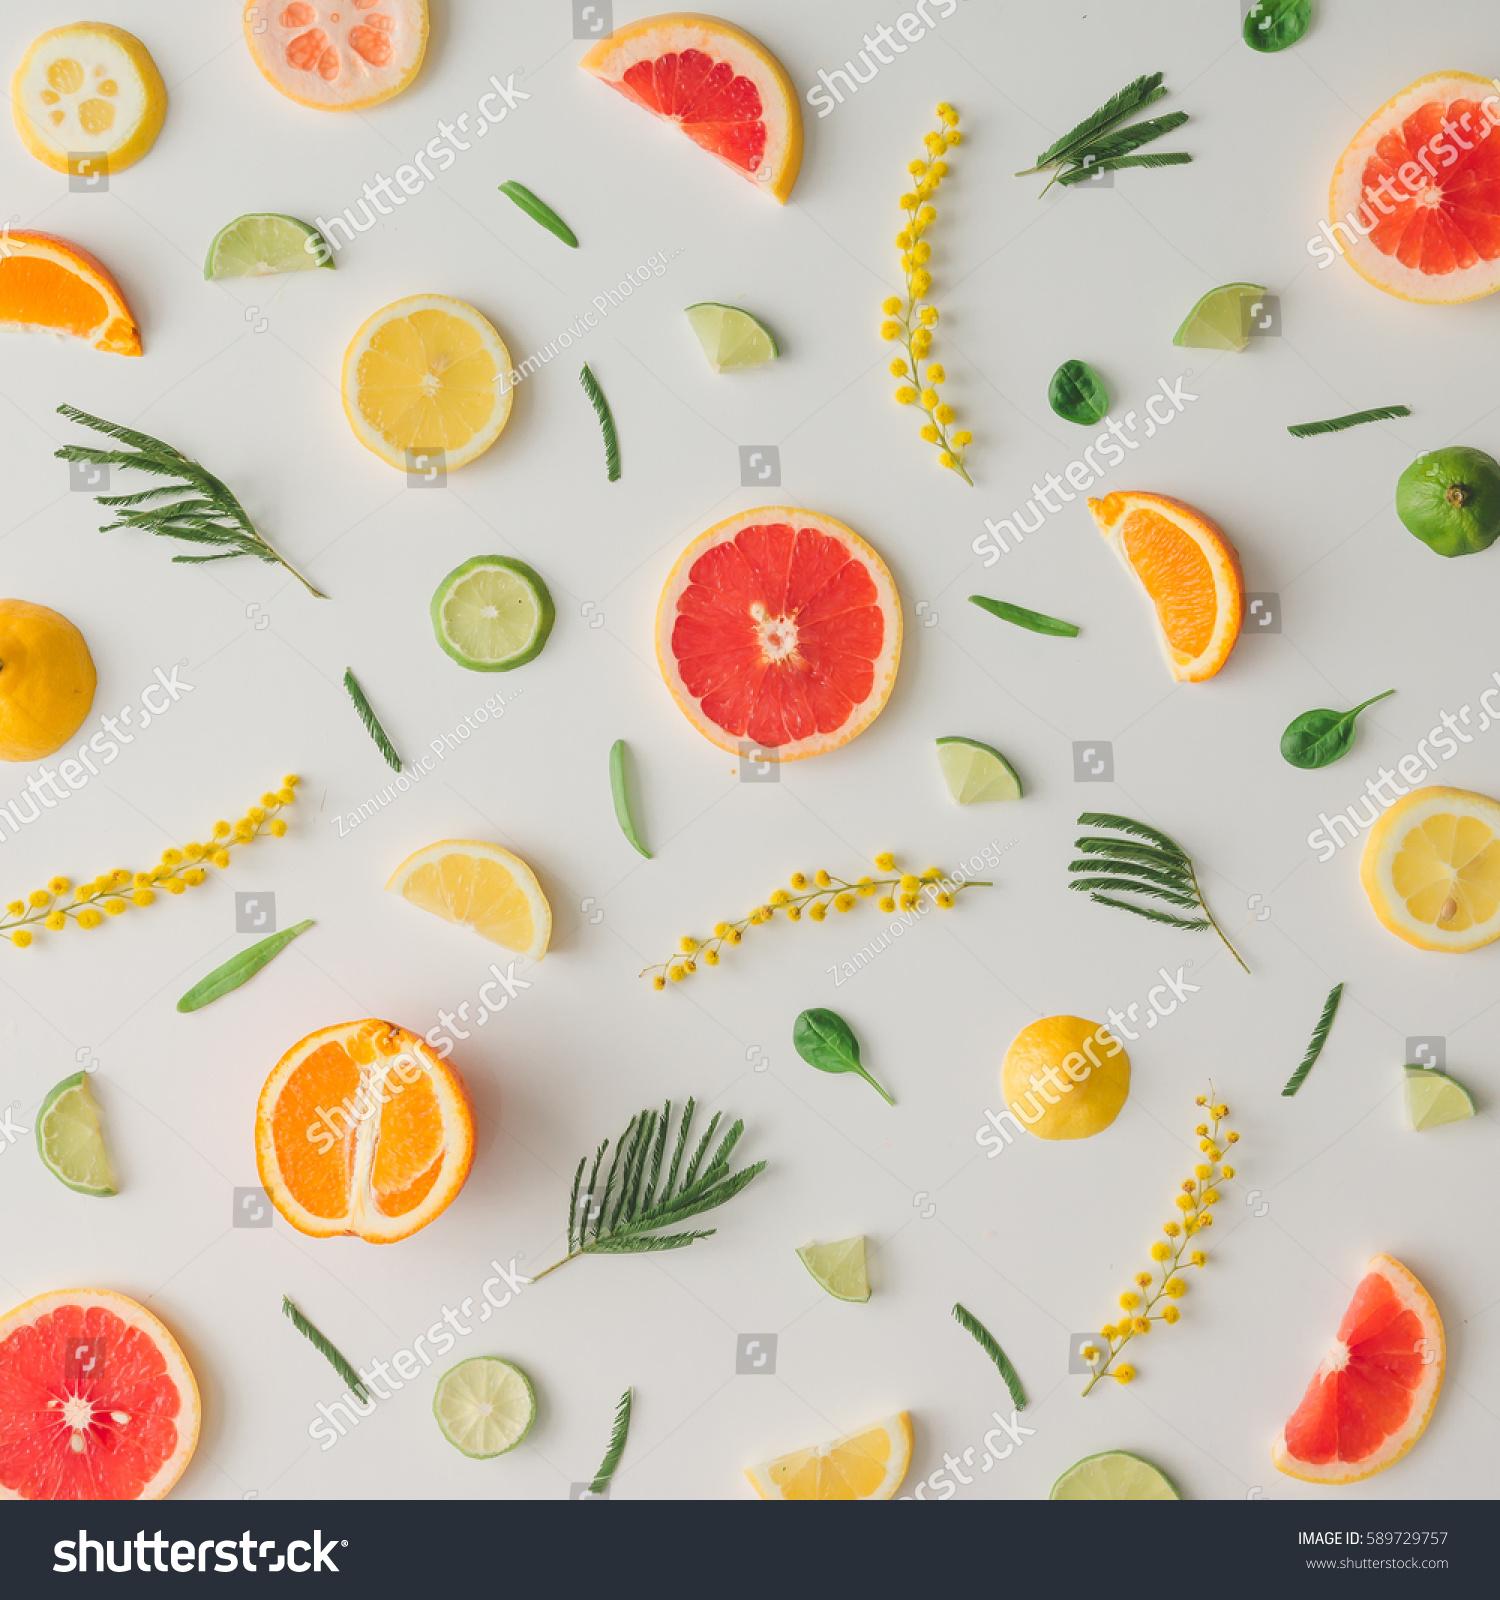 Colorful Food Pattern Made Lemon Orange Stock Photo ...